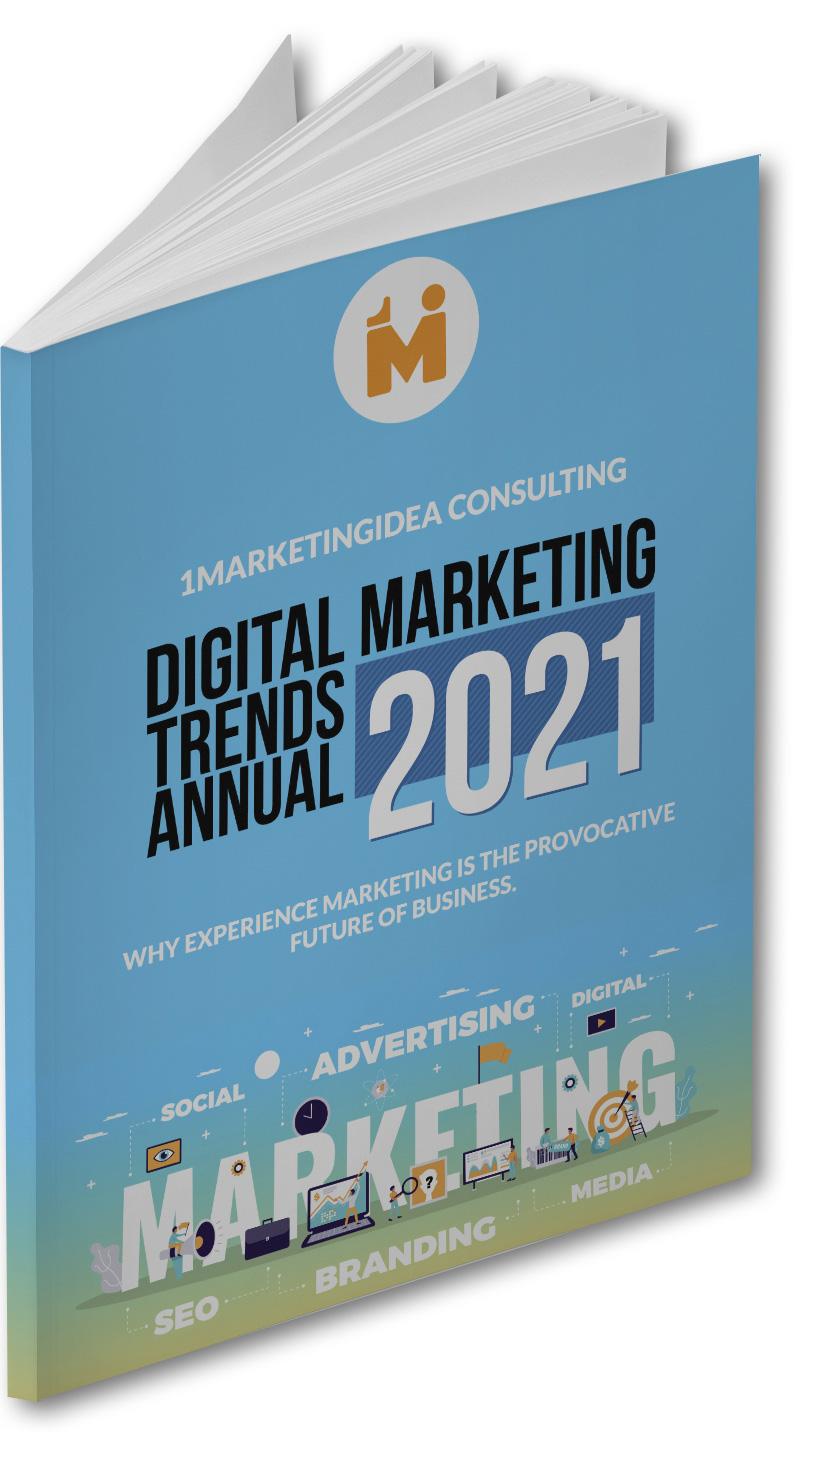 Annual Marketing Trends Report - 1marketingidea